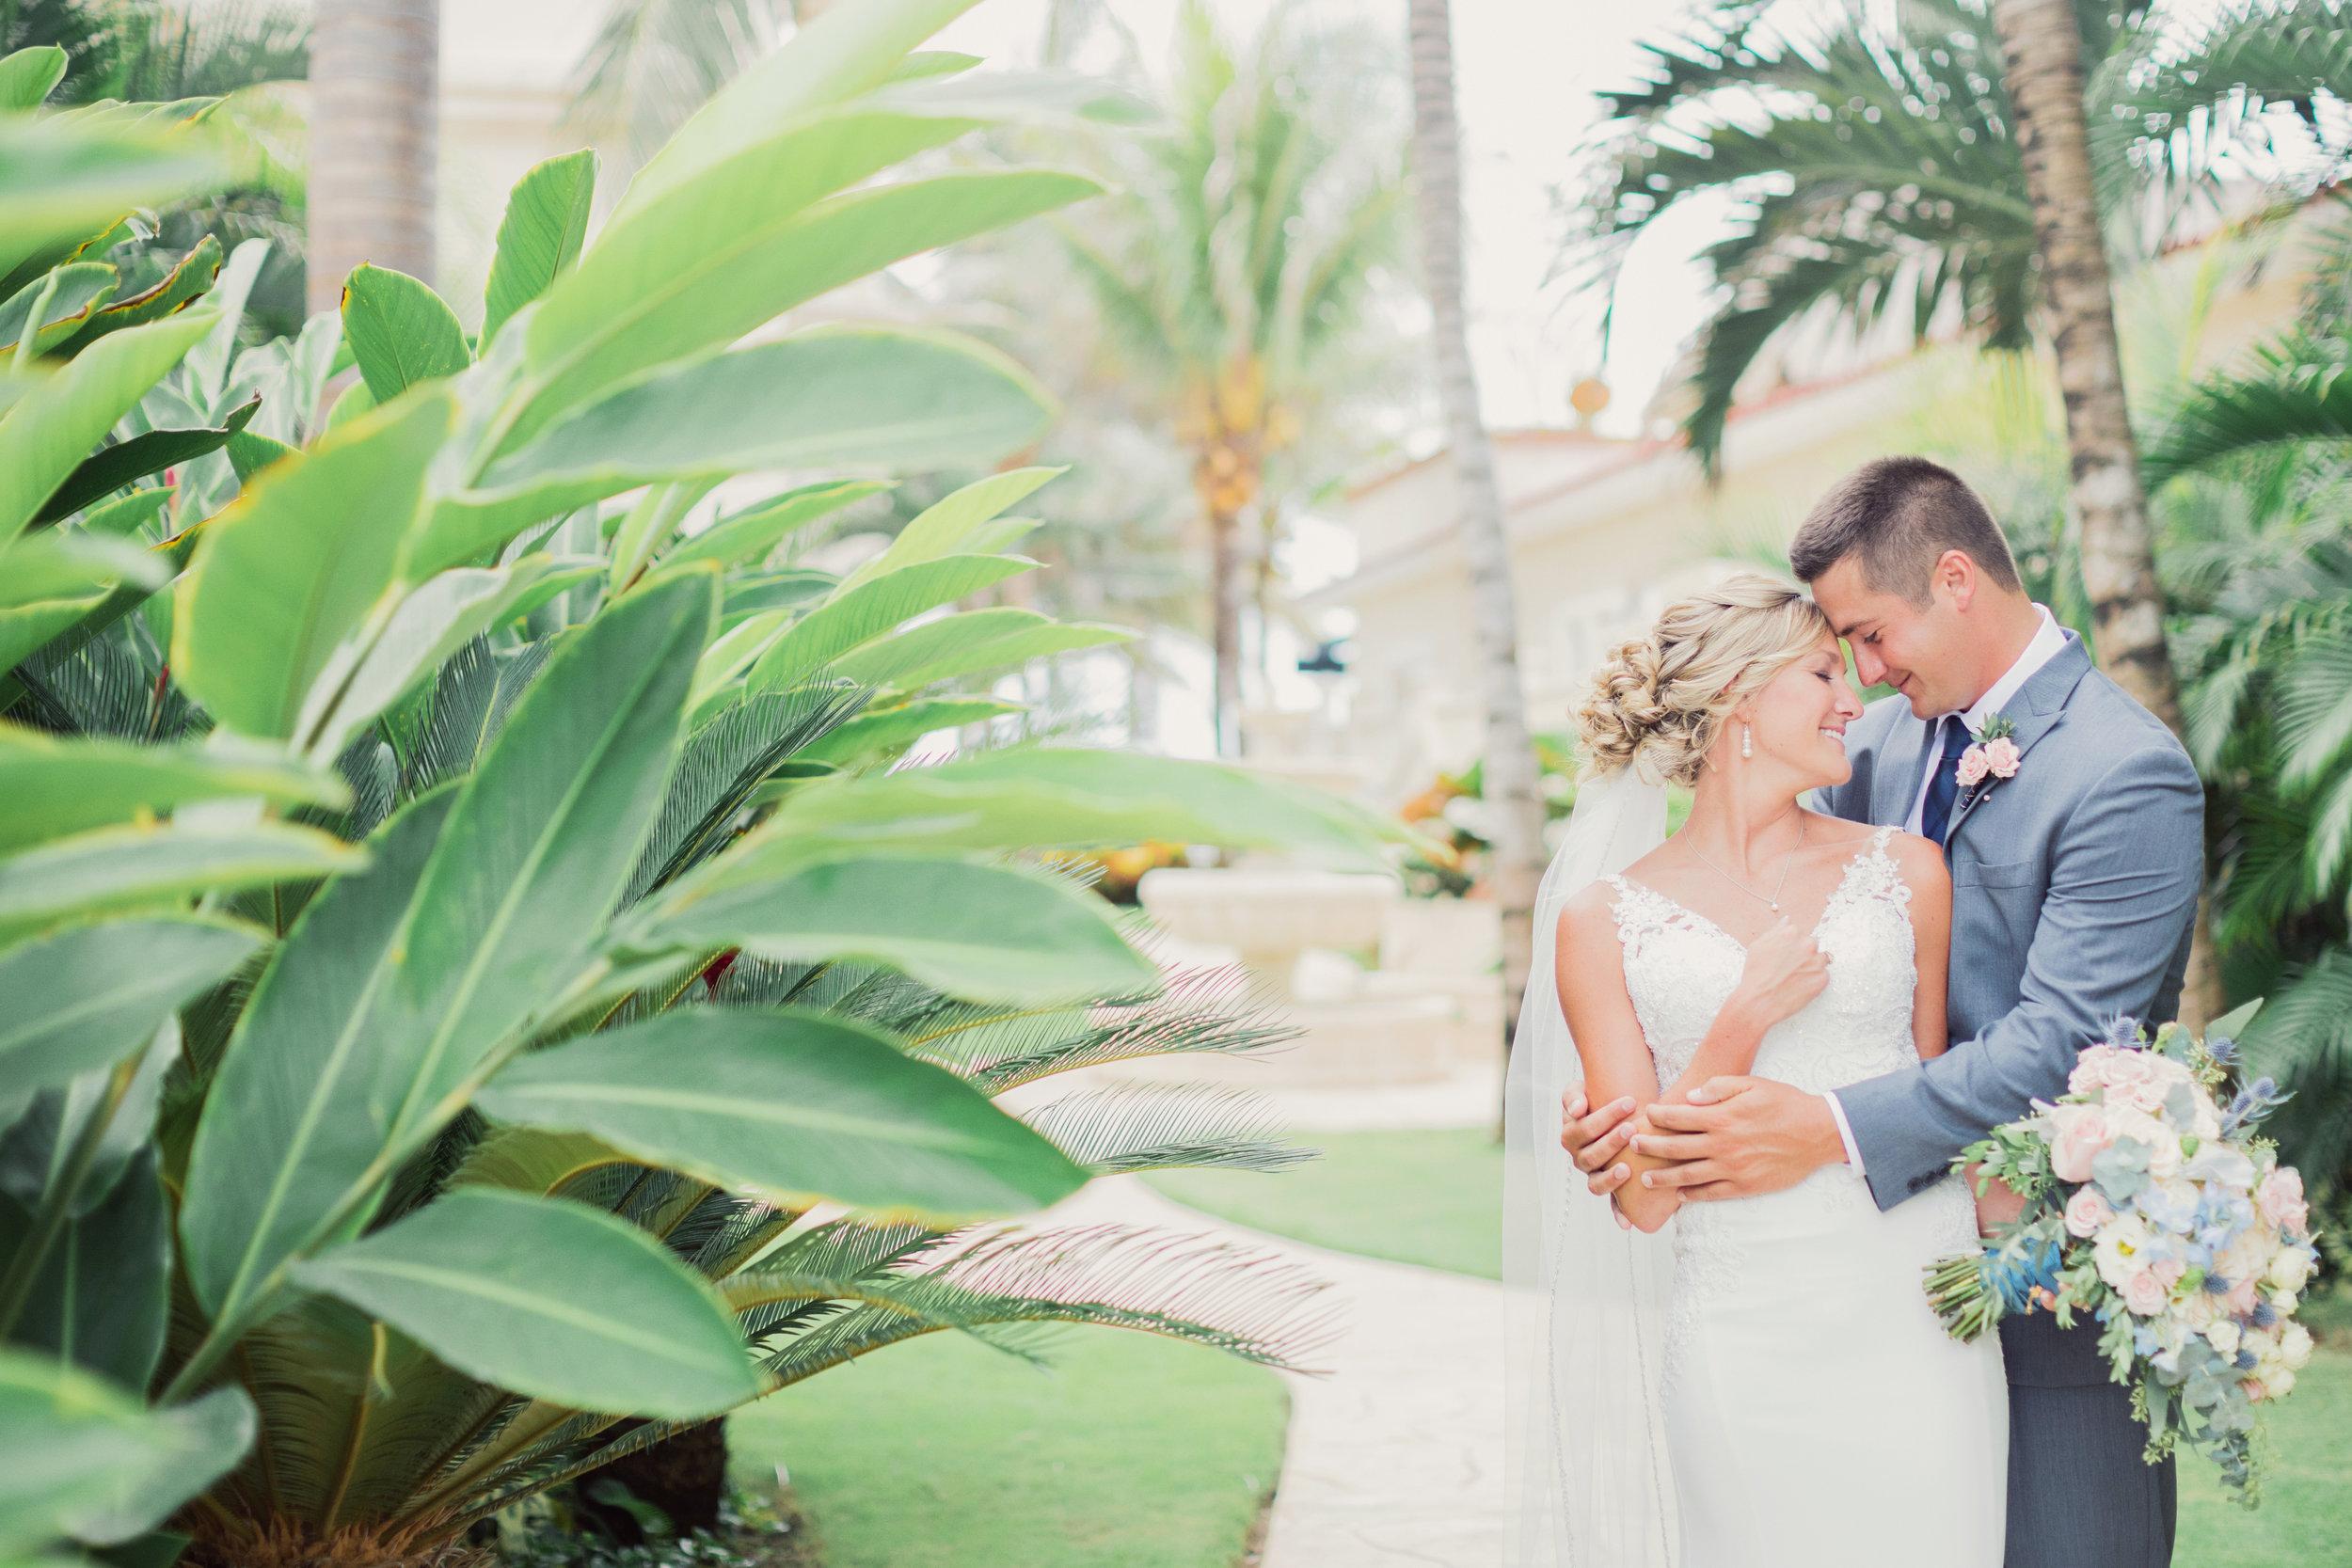 cancun-wedding-venue-villa-la-joya-69.jpg